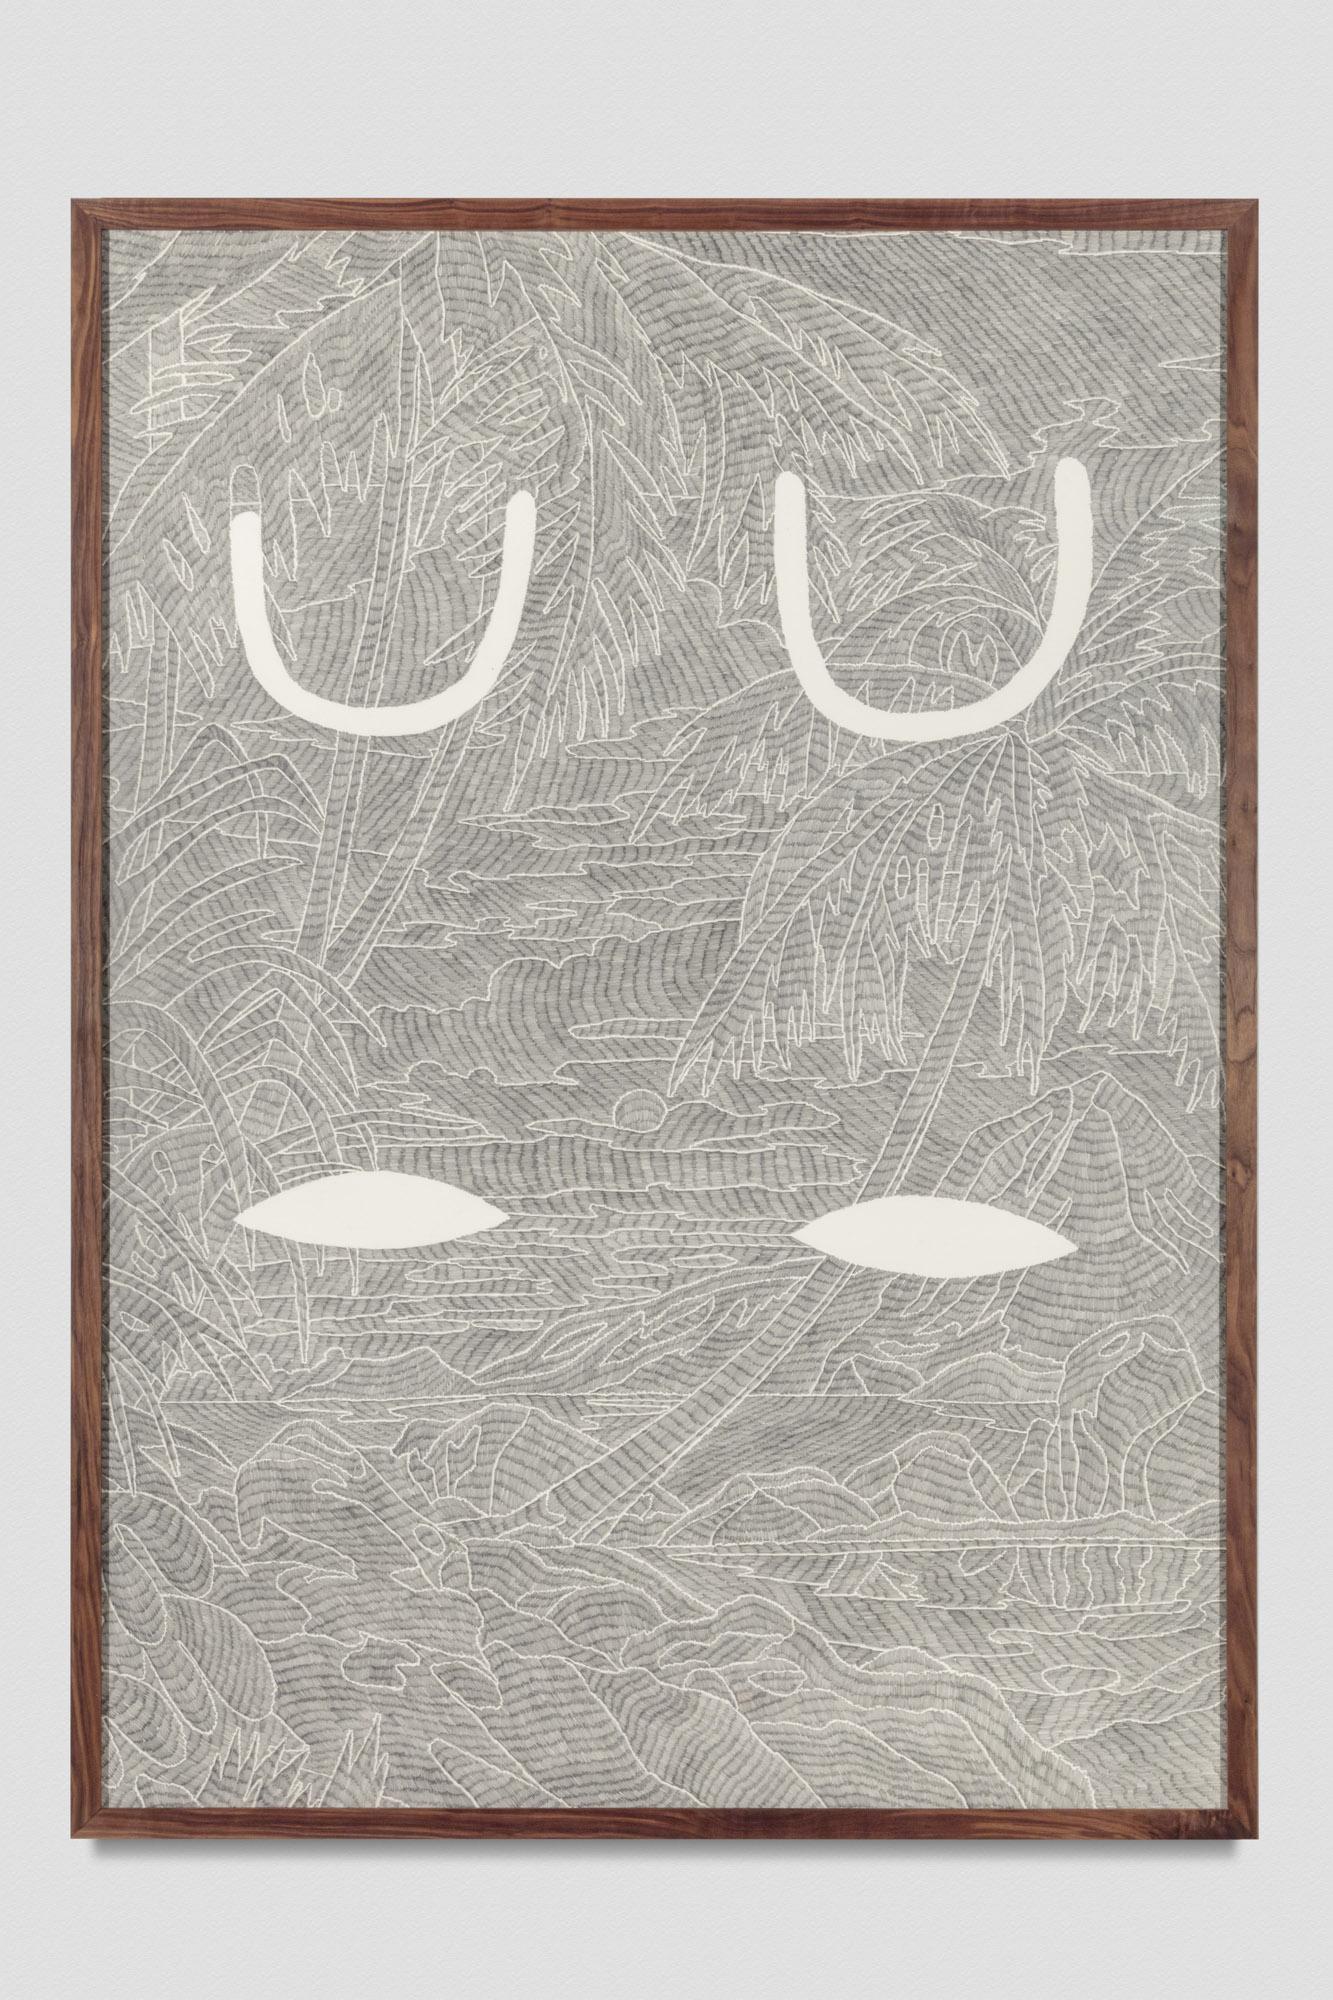 Laith McGregor,  Hopeful , 2017, pencil on paper ,2030 x 1530 mm